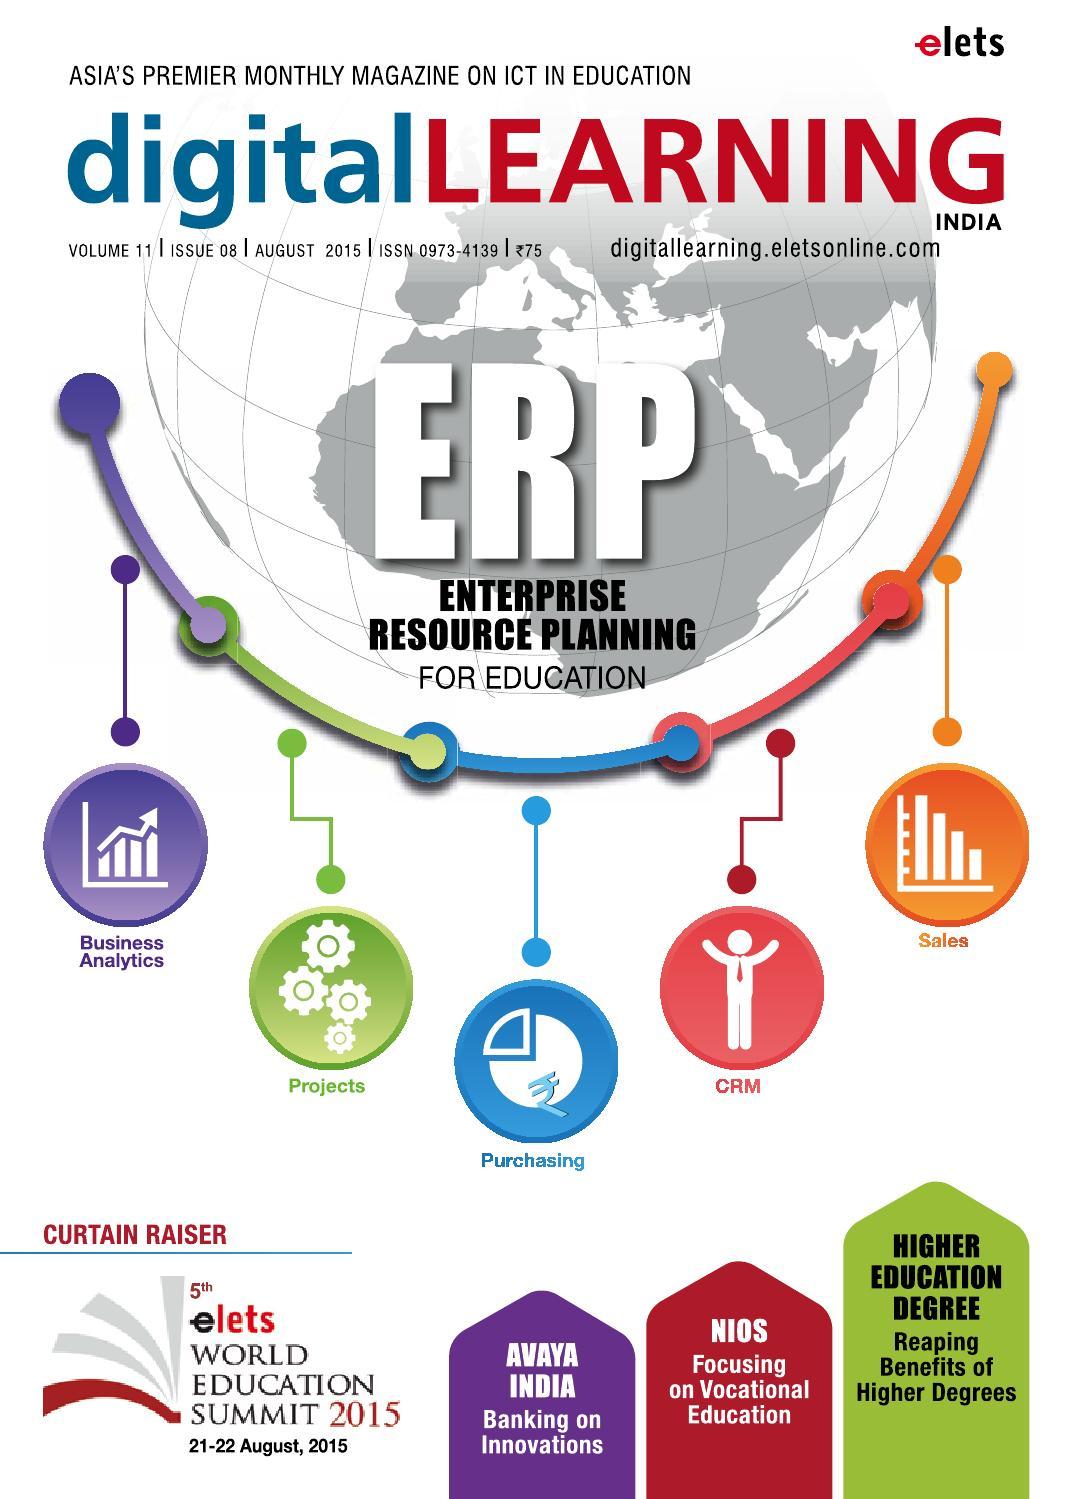 digitalLEARNING August 2015 by digital LEARNING Magazine - Elets